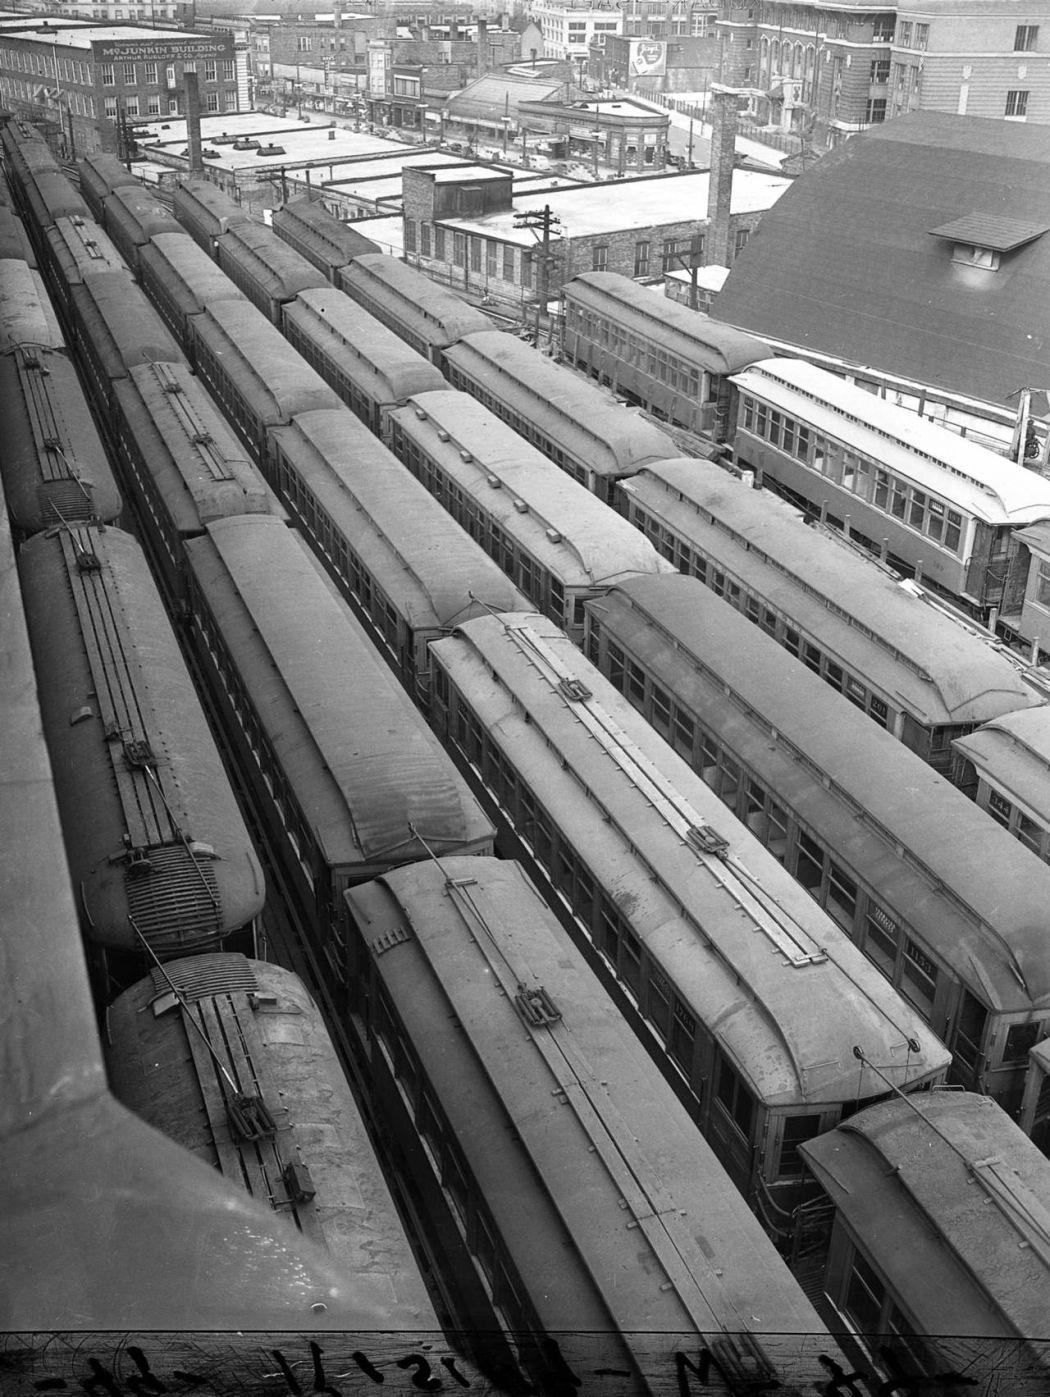 chicago-L-train-line-1900s-15